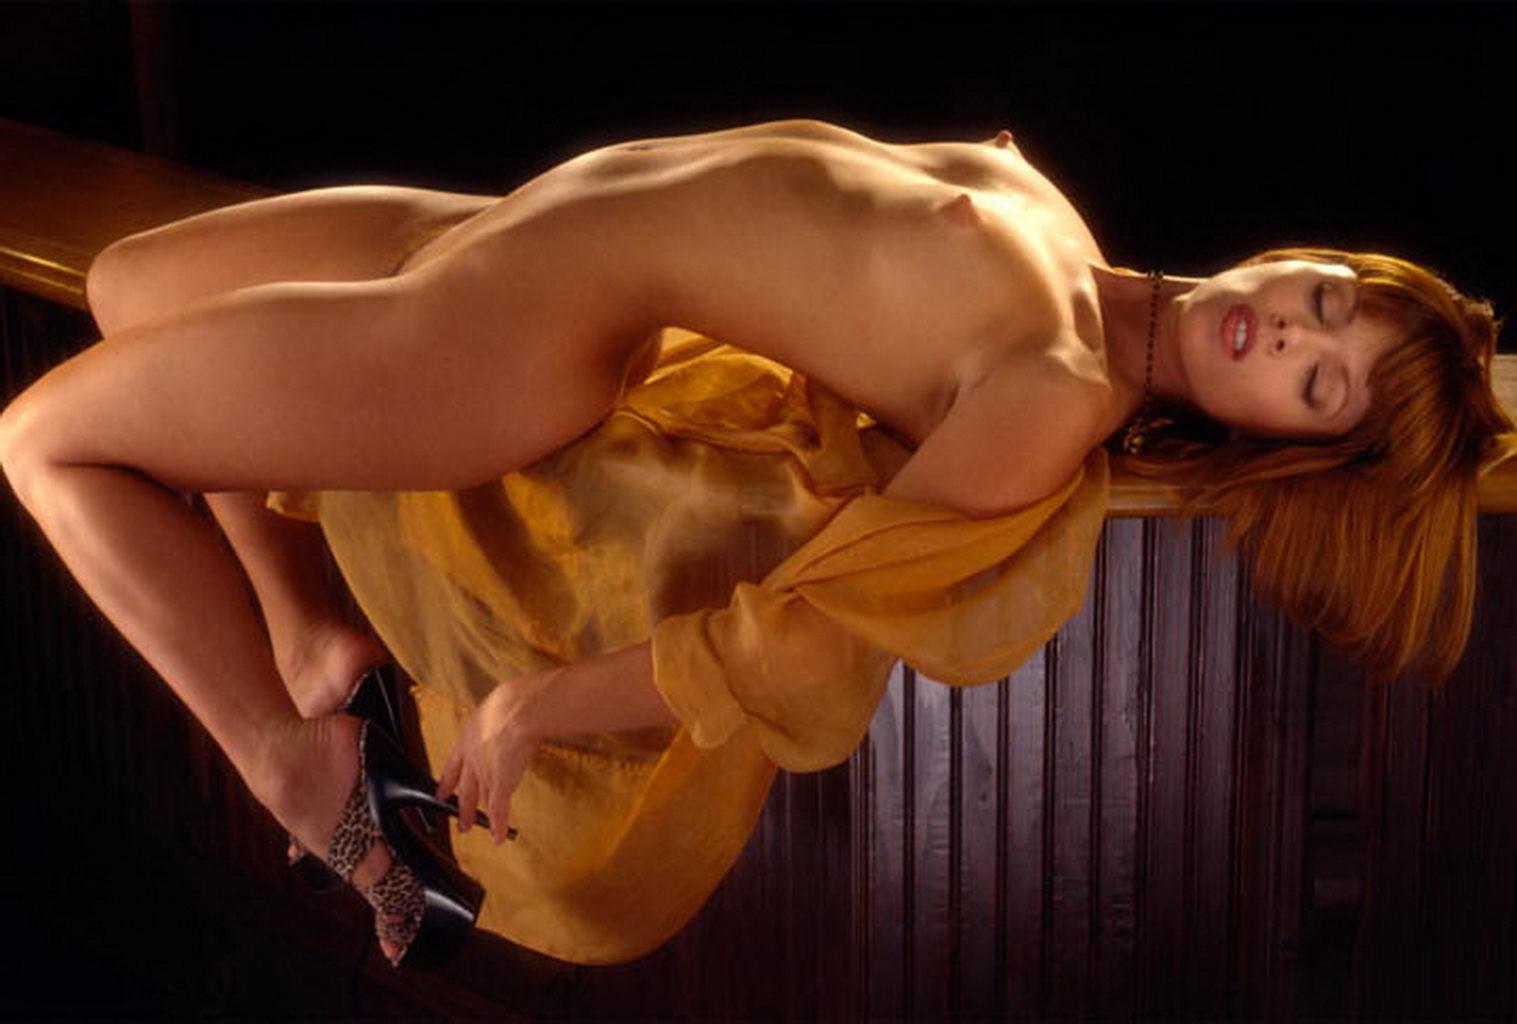 Sex video online